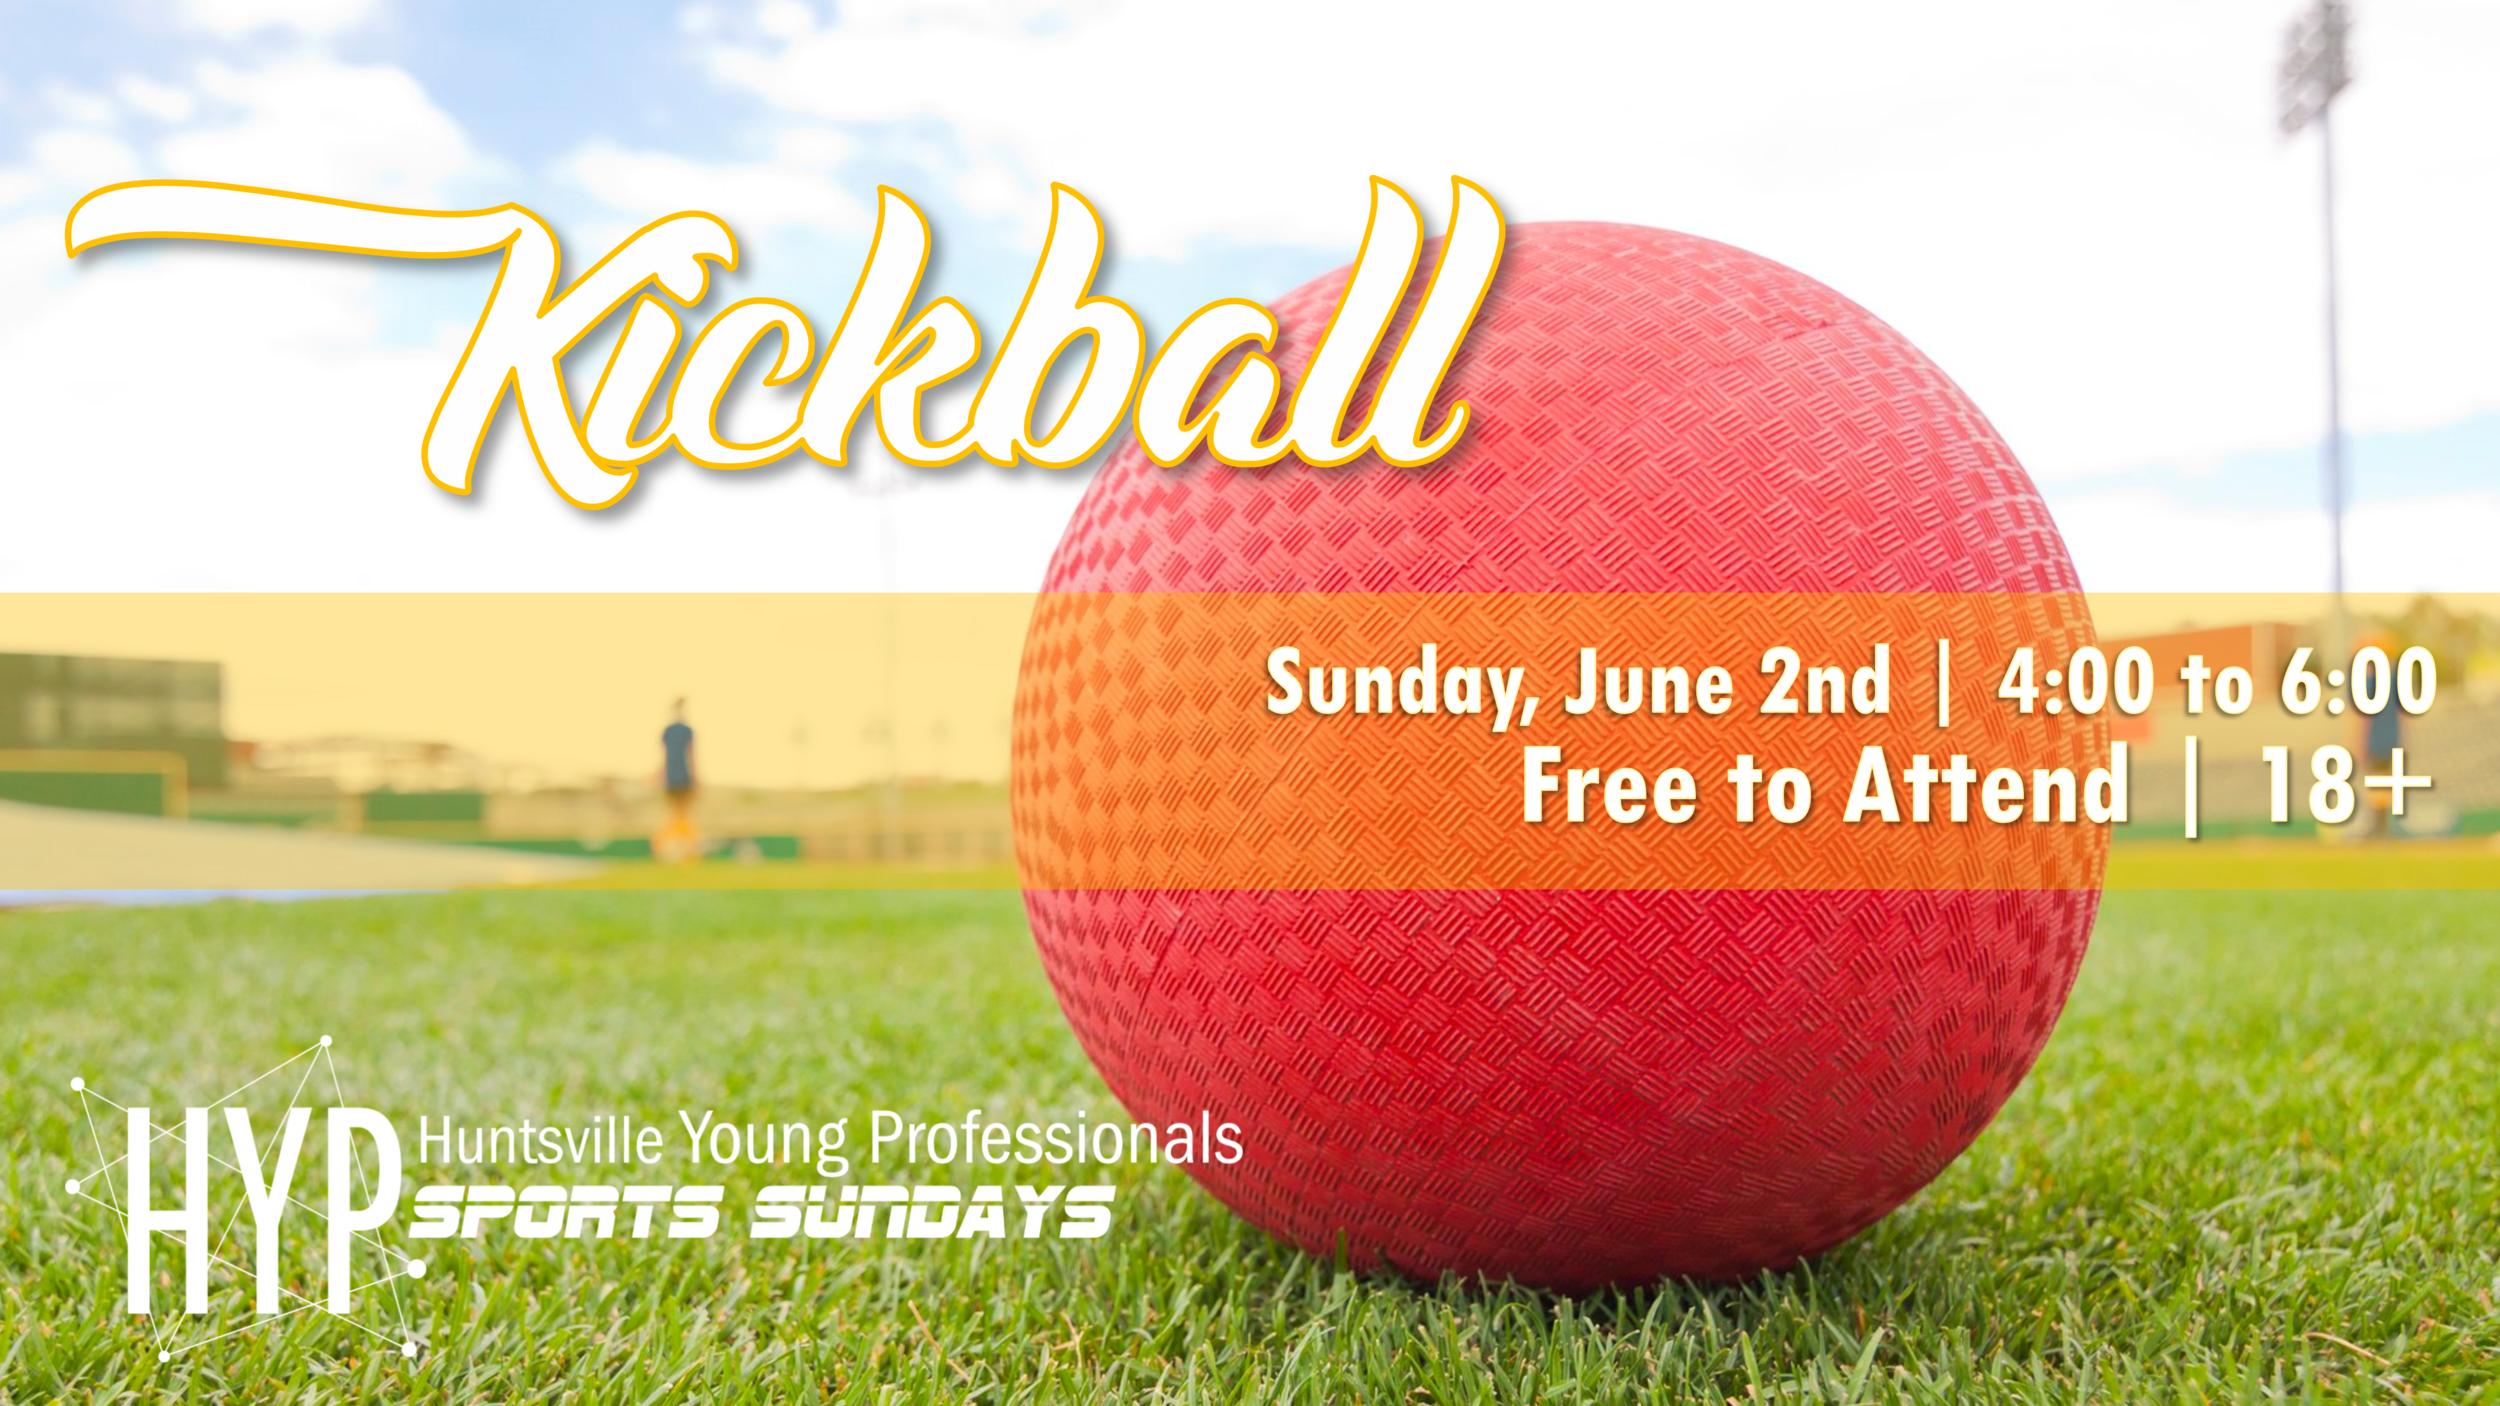 kickball2.png